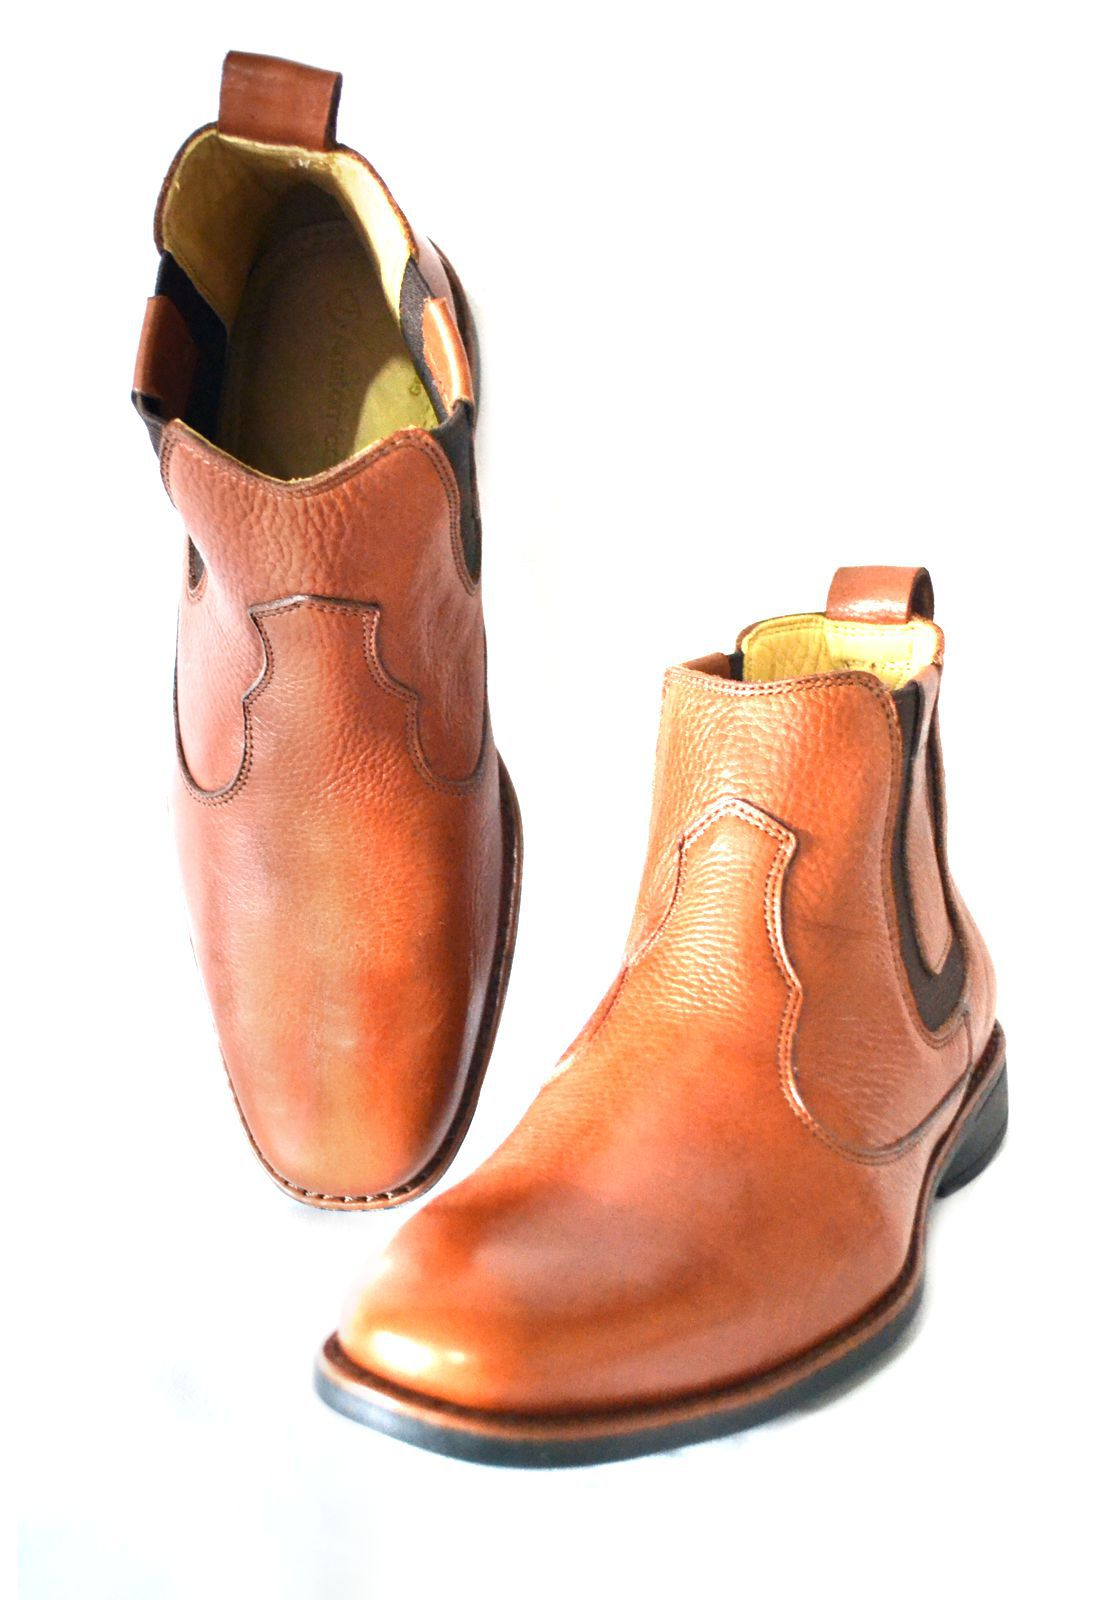 Botina Masculina Anatomic Gel Boots 1010294 Café